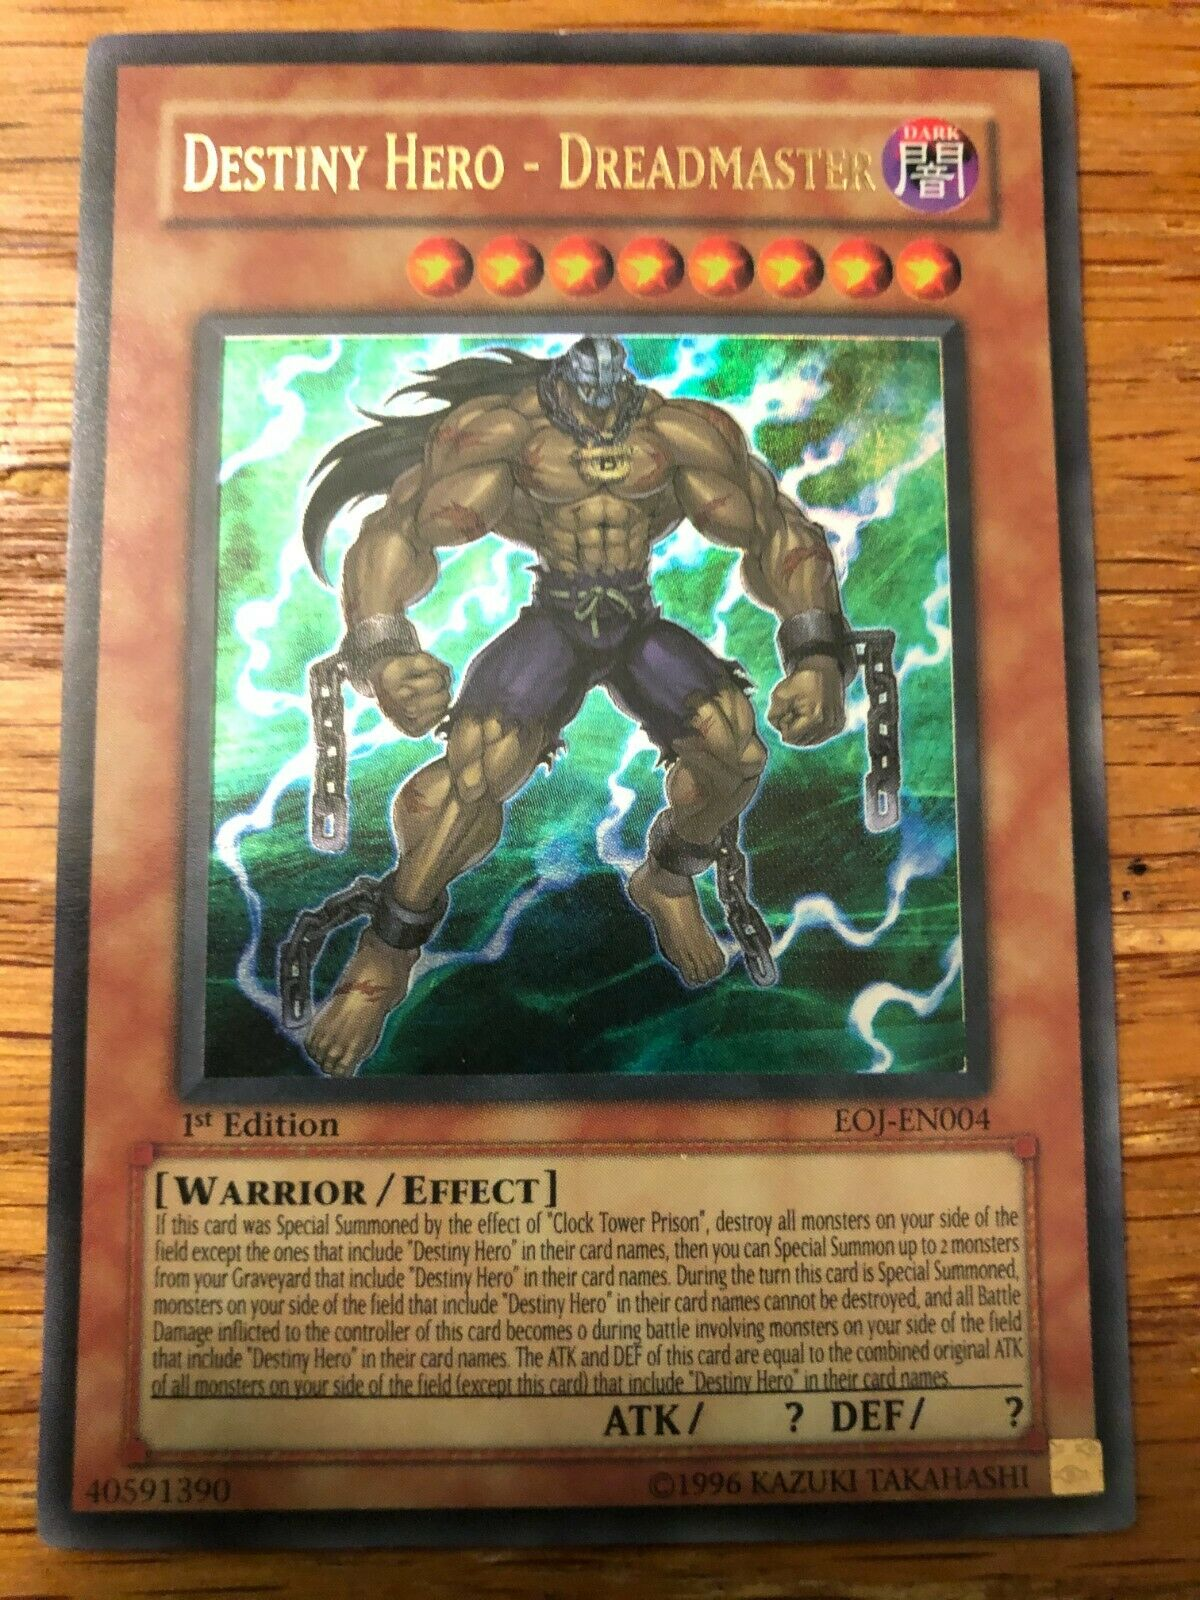 Yu-Gi-Oh! Dreadmaster EOJ-JP004 Ultimate Japan Destiny HERO